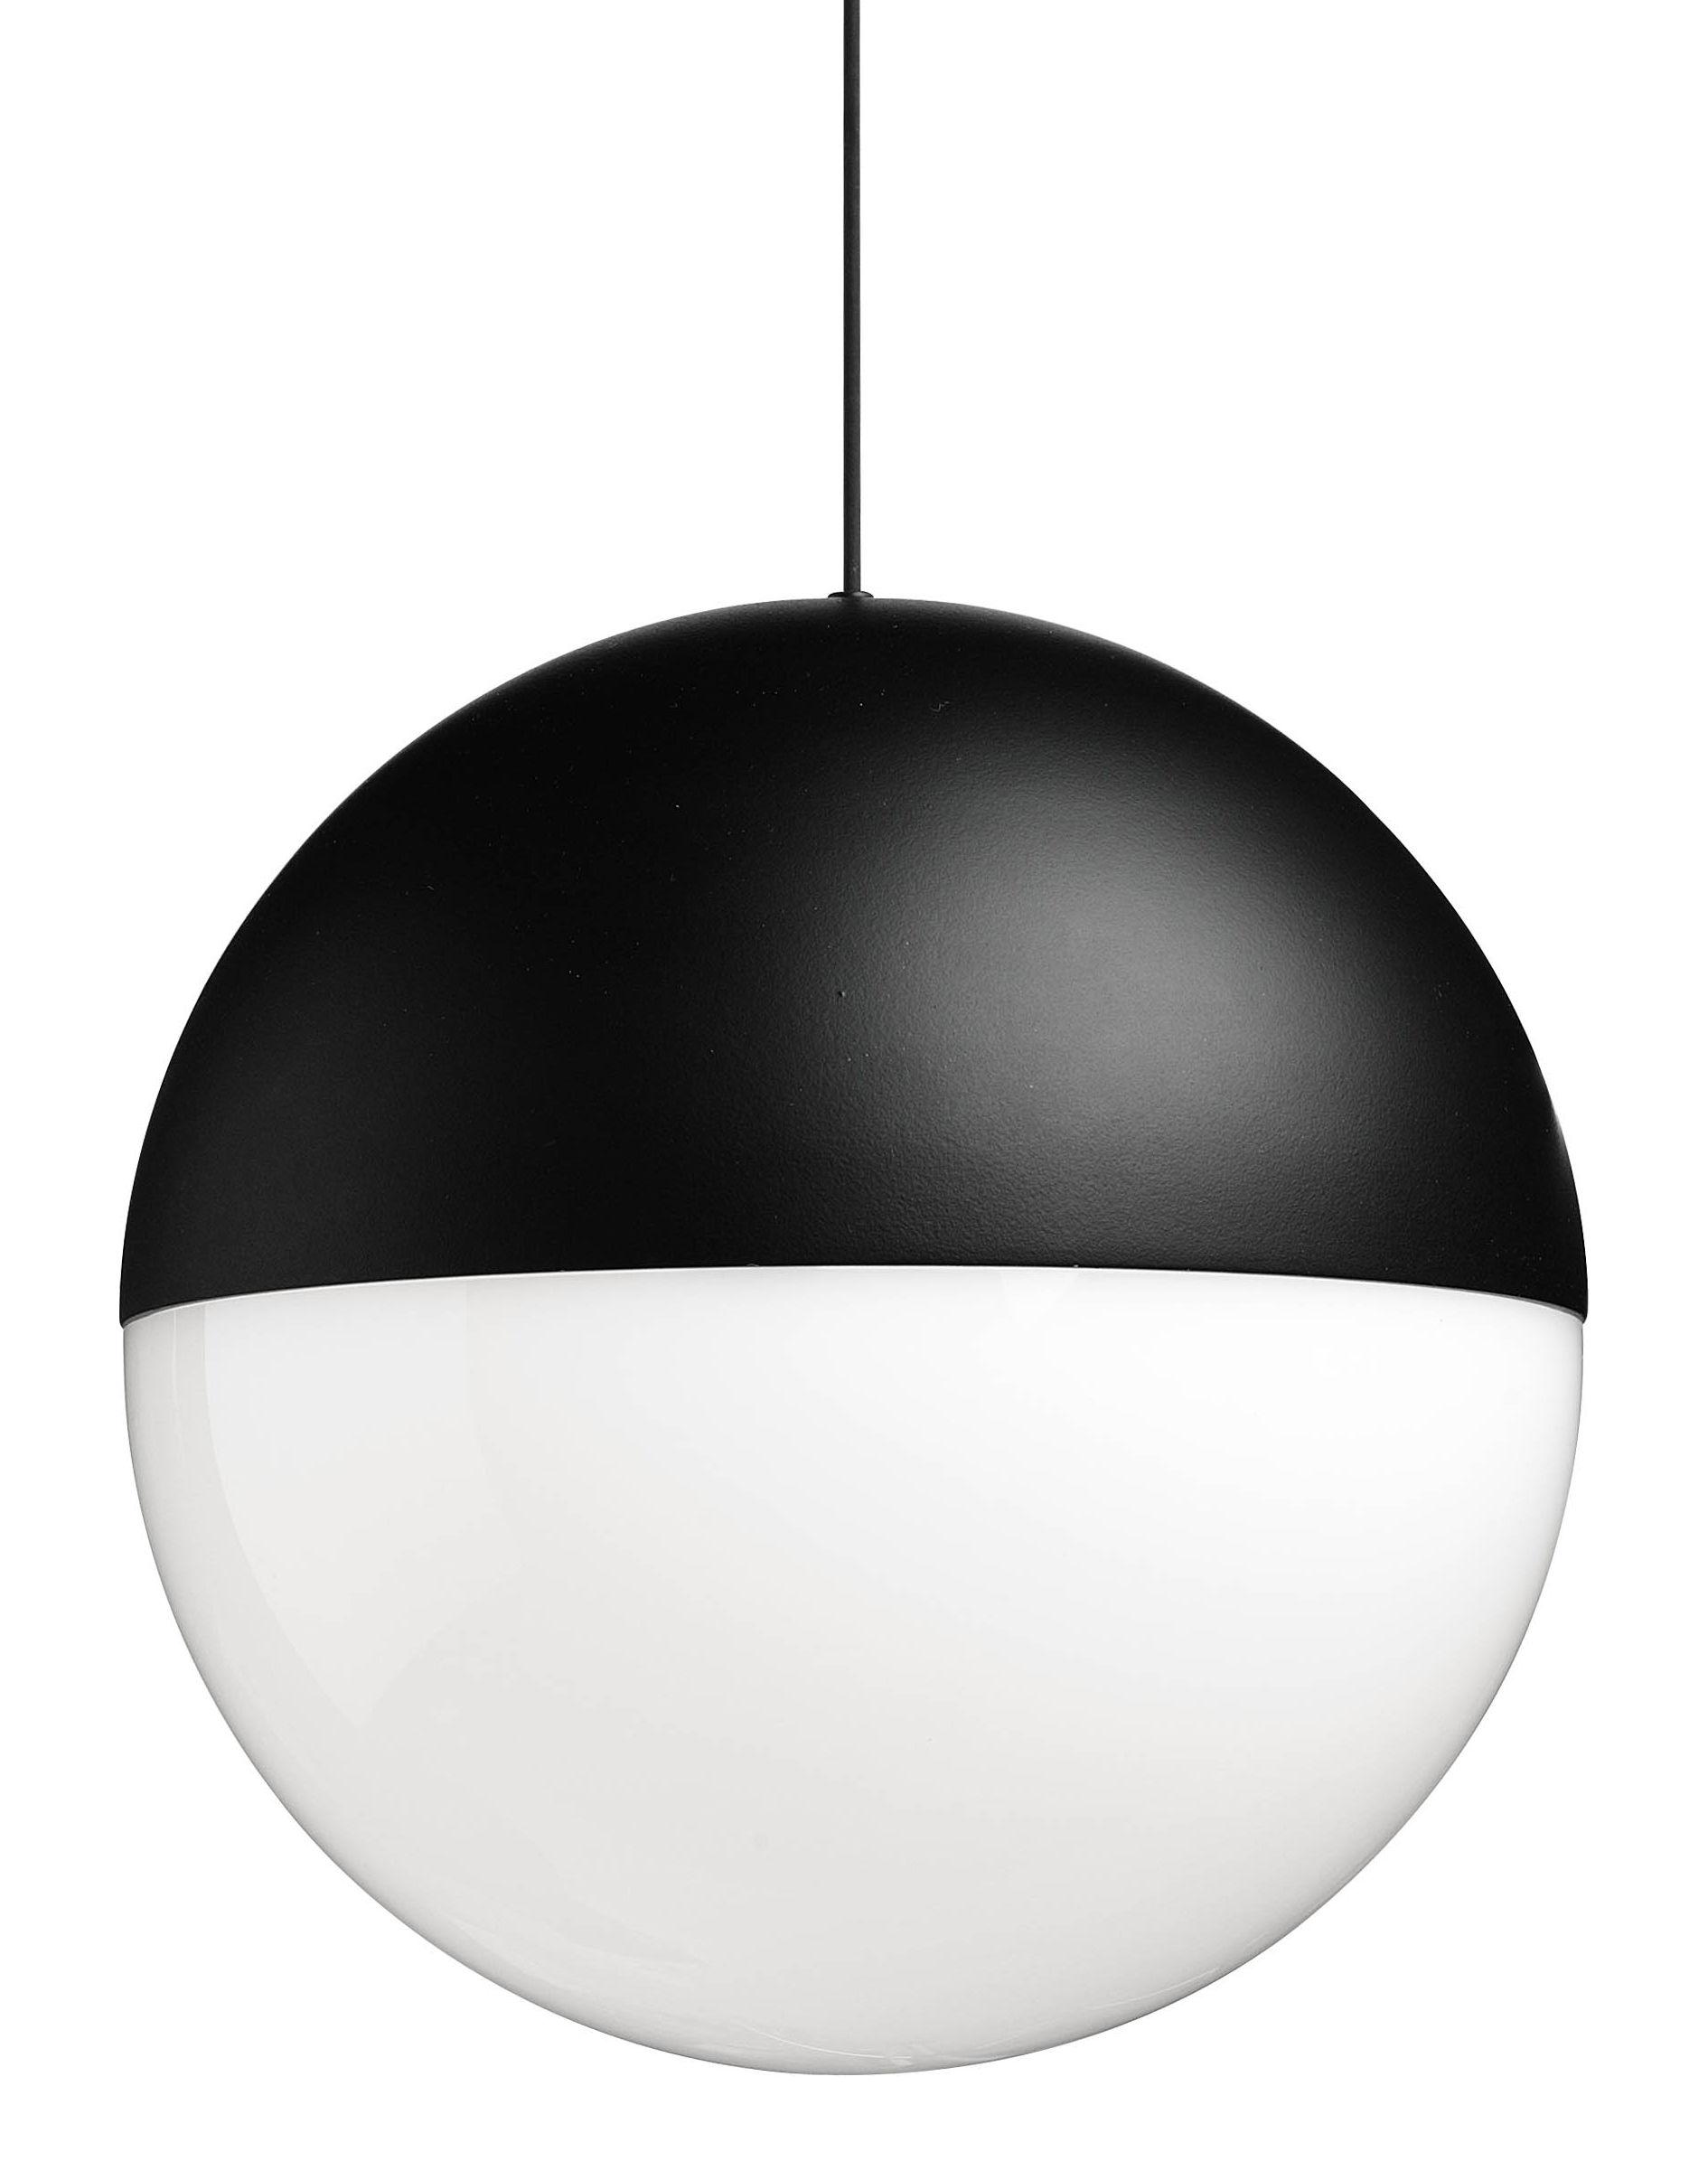 Leuchten - Pendelleuchten - String Light Sphere Pendelleuchte LED / 12 m langes Kabel als Deko-Element - Flos - Hängelampe in Kugelform / Schwarz - bemaltes Aluminium, Gewebe, Polykarbonat